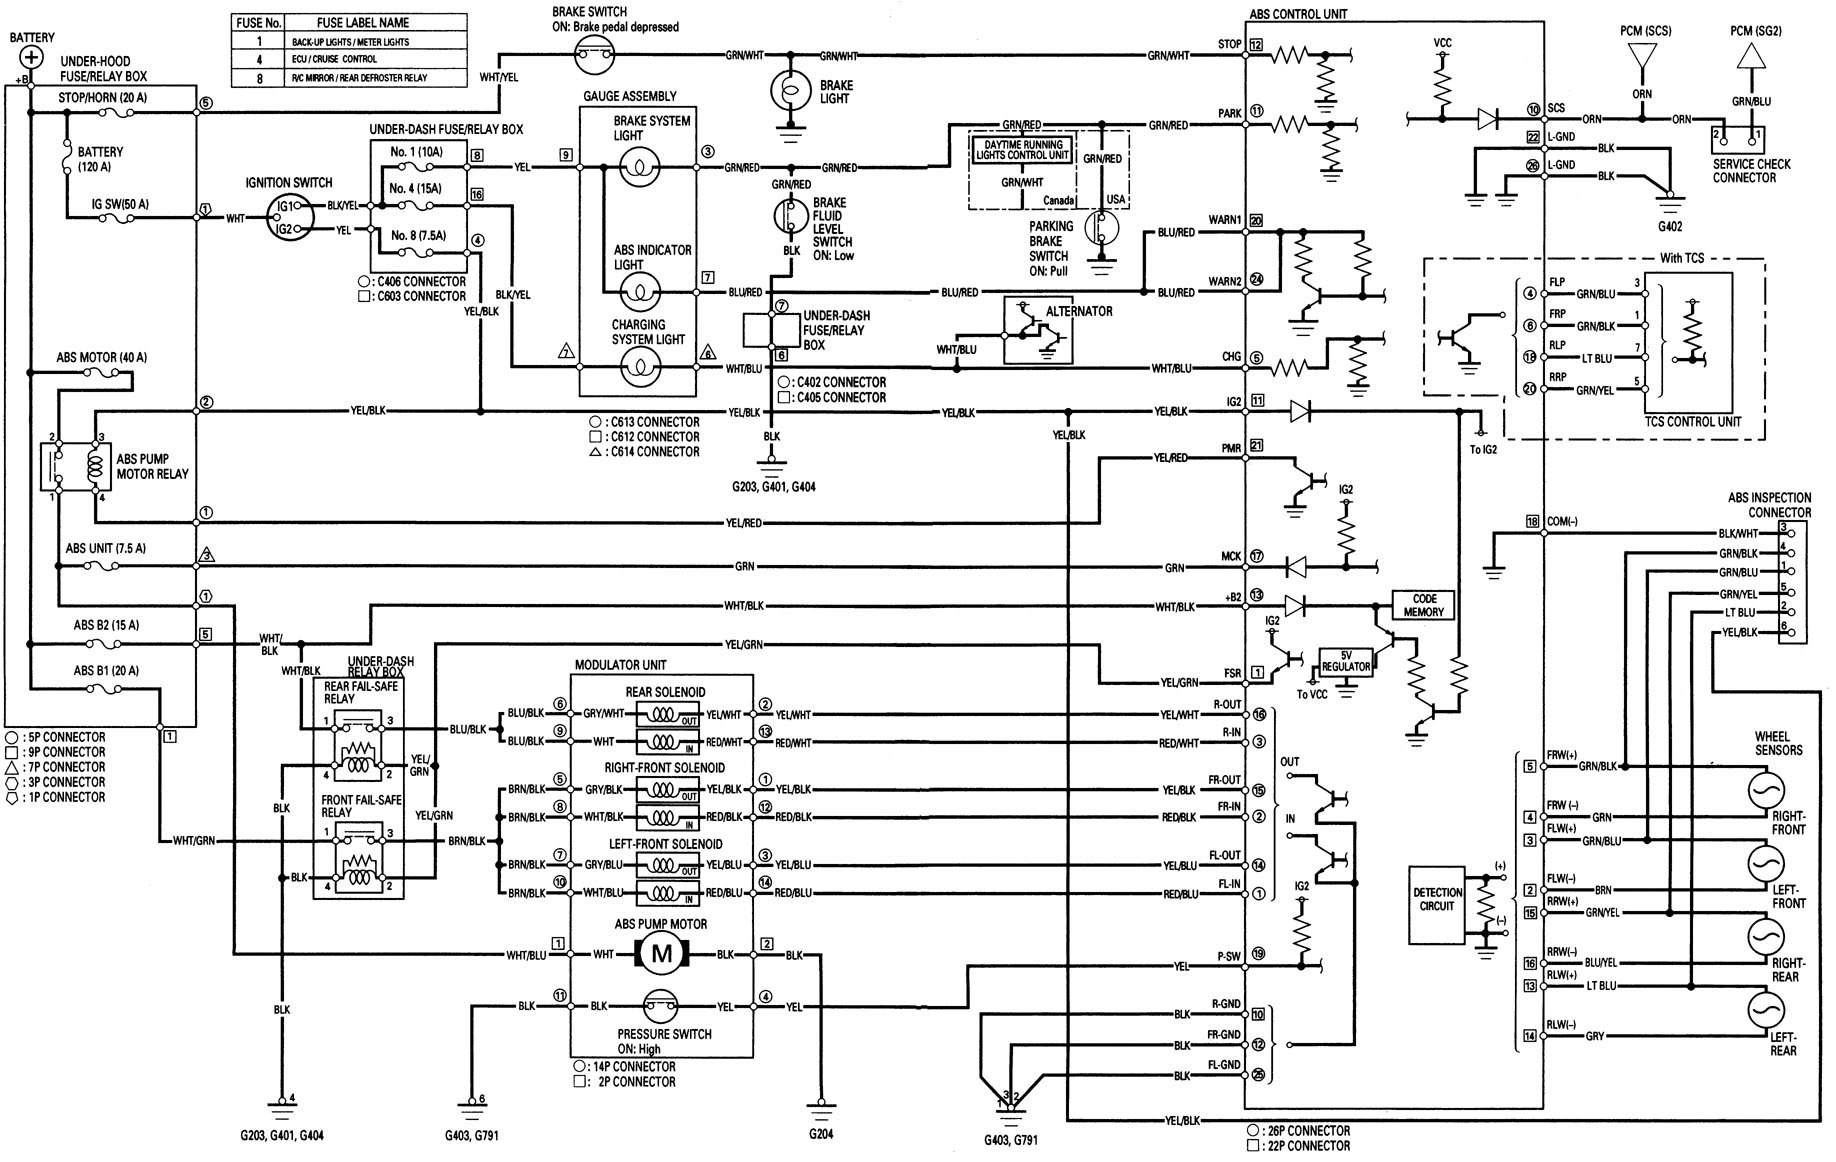 Acura Tl  1998  - Wiring Diagrams - Brake Controls